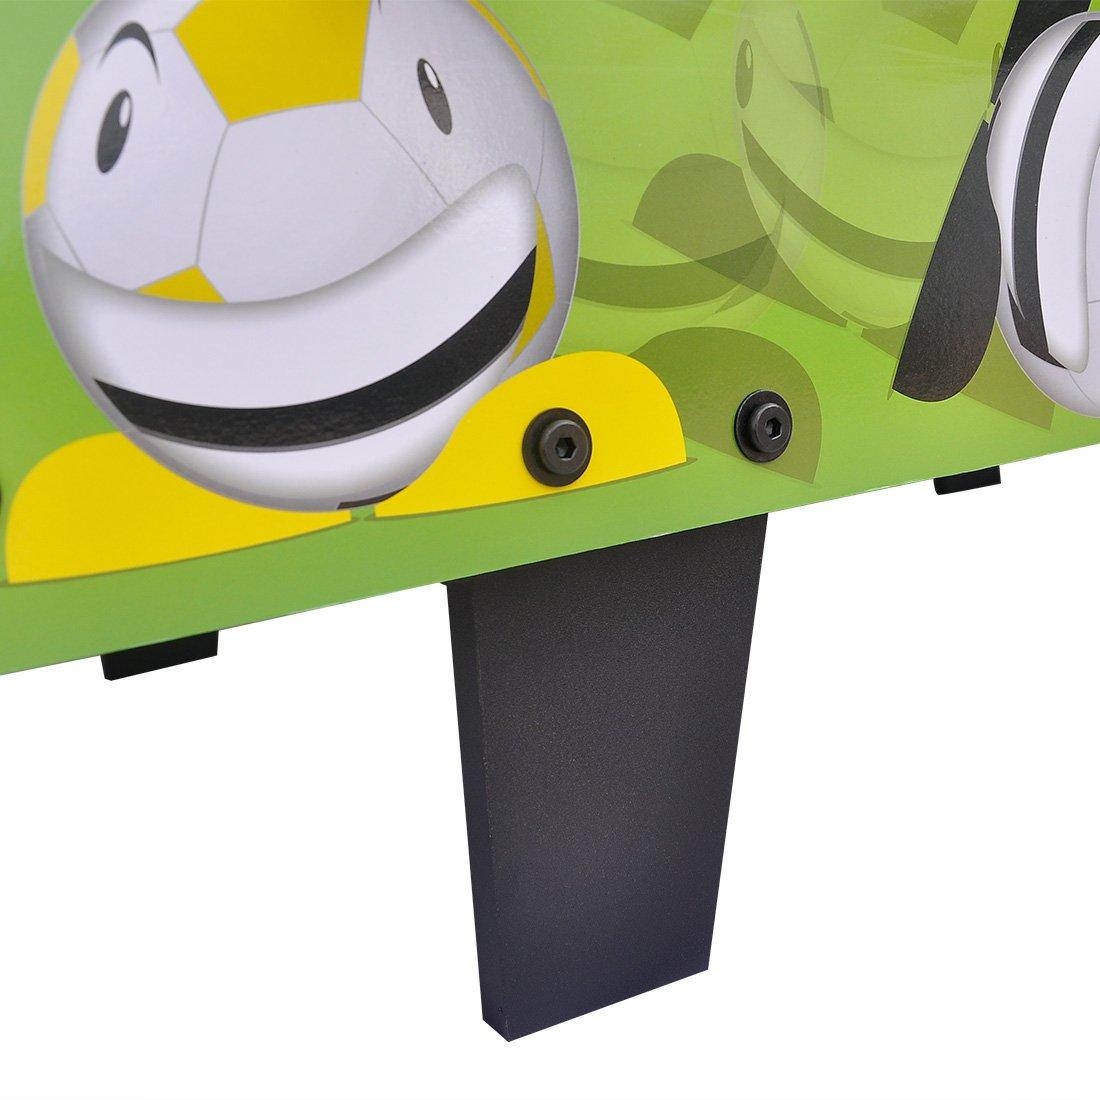 HLC 3 ft (92 * 46.2 * 26 cm) mesa fútbol mesa kiker para niños ...